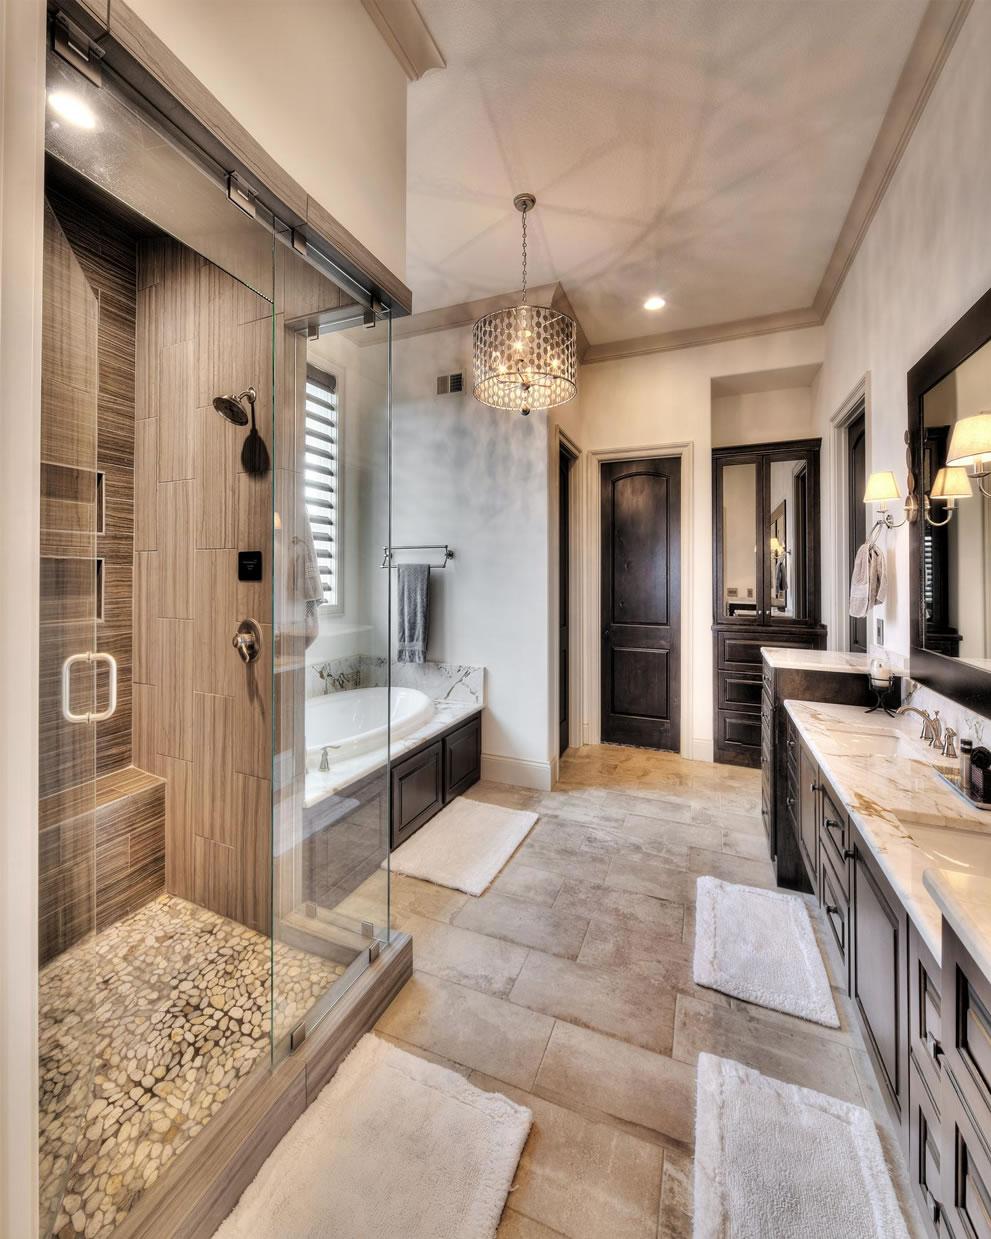 houston bathroom remodeling contractors